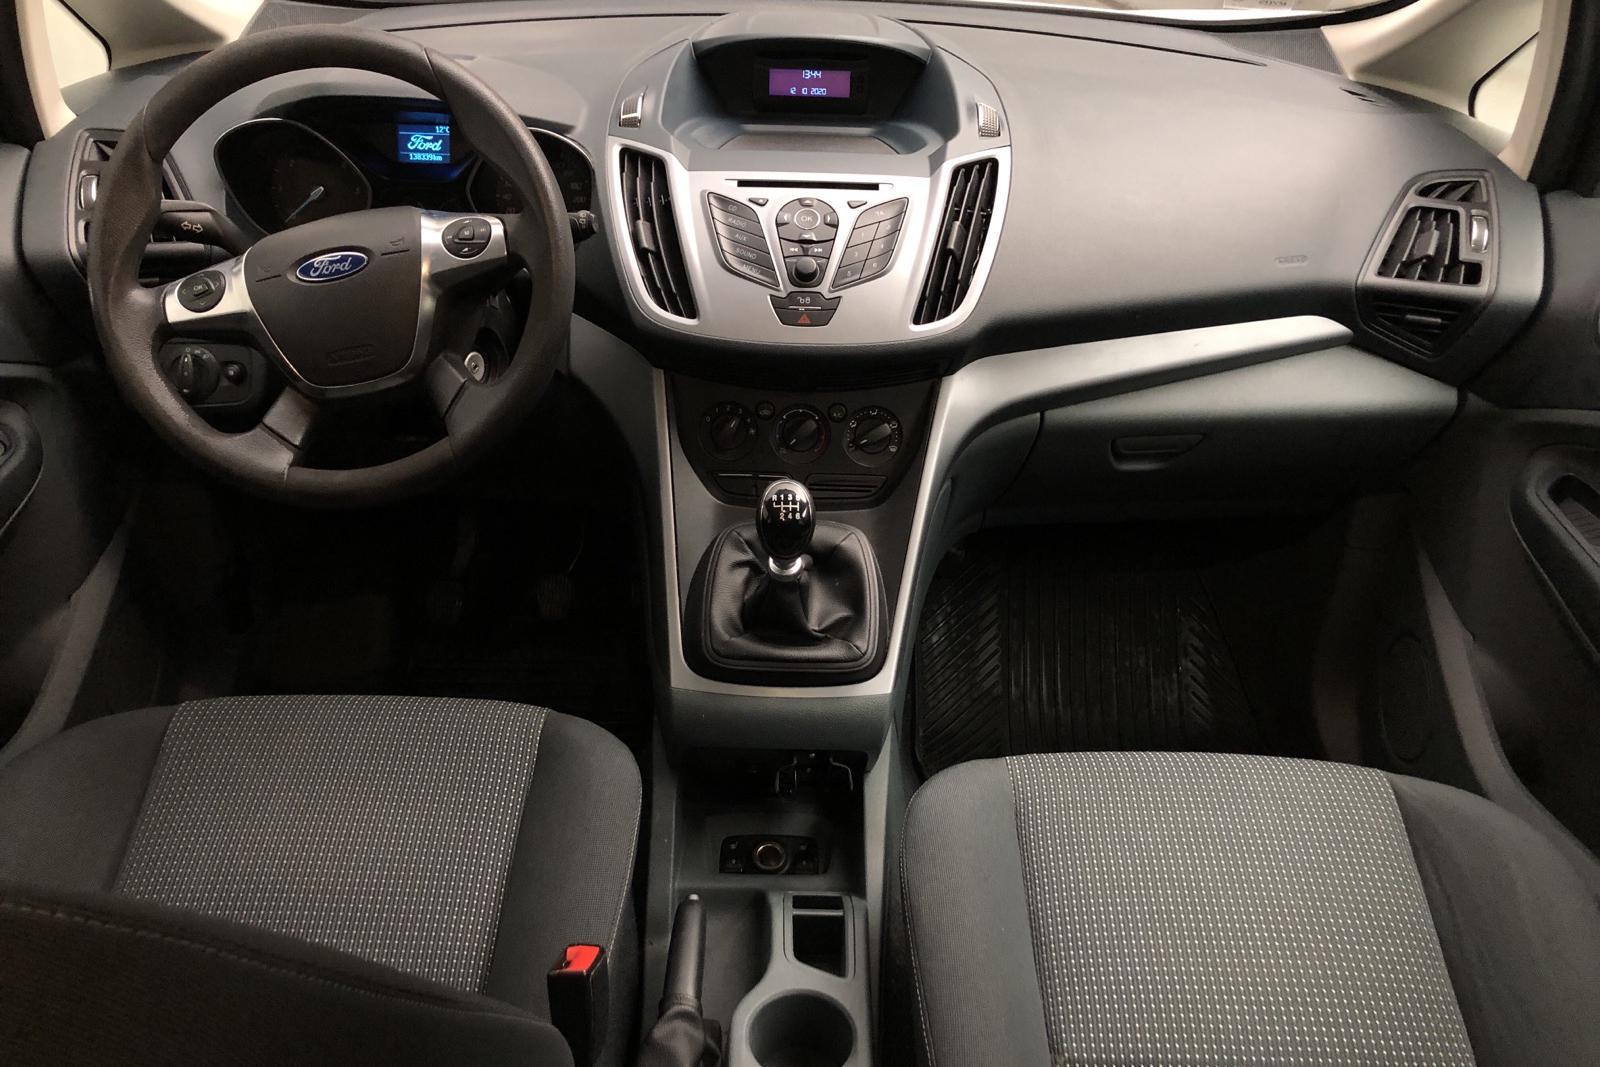 Ford C-MAX 1.6 TDCi (95hk) - 0 km - Manual - white - 2011